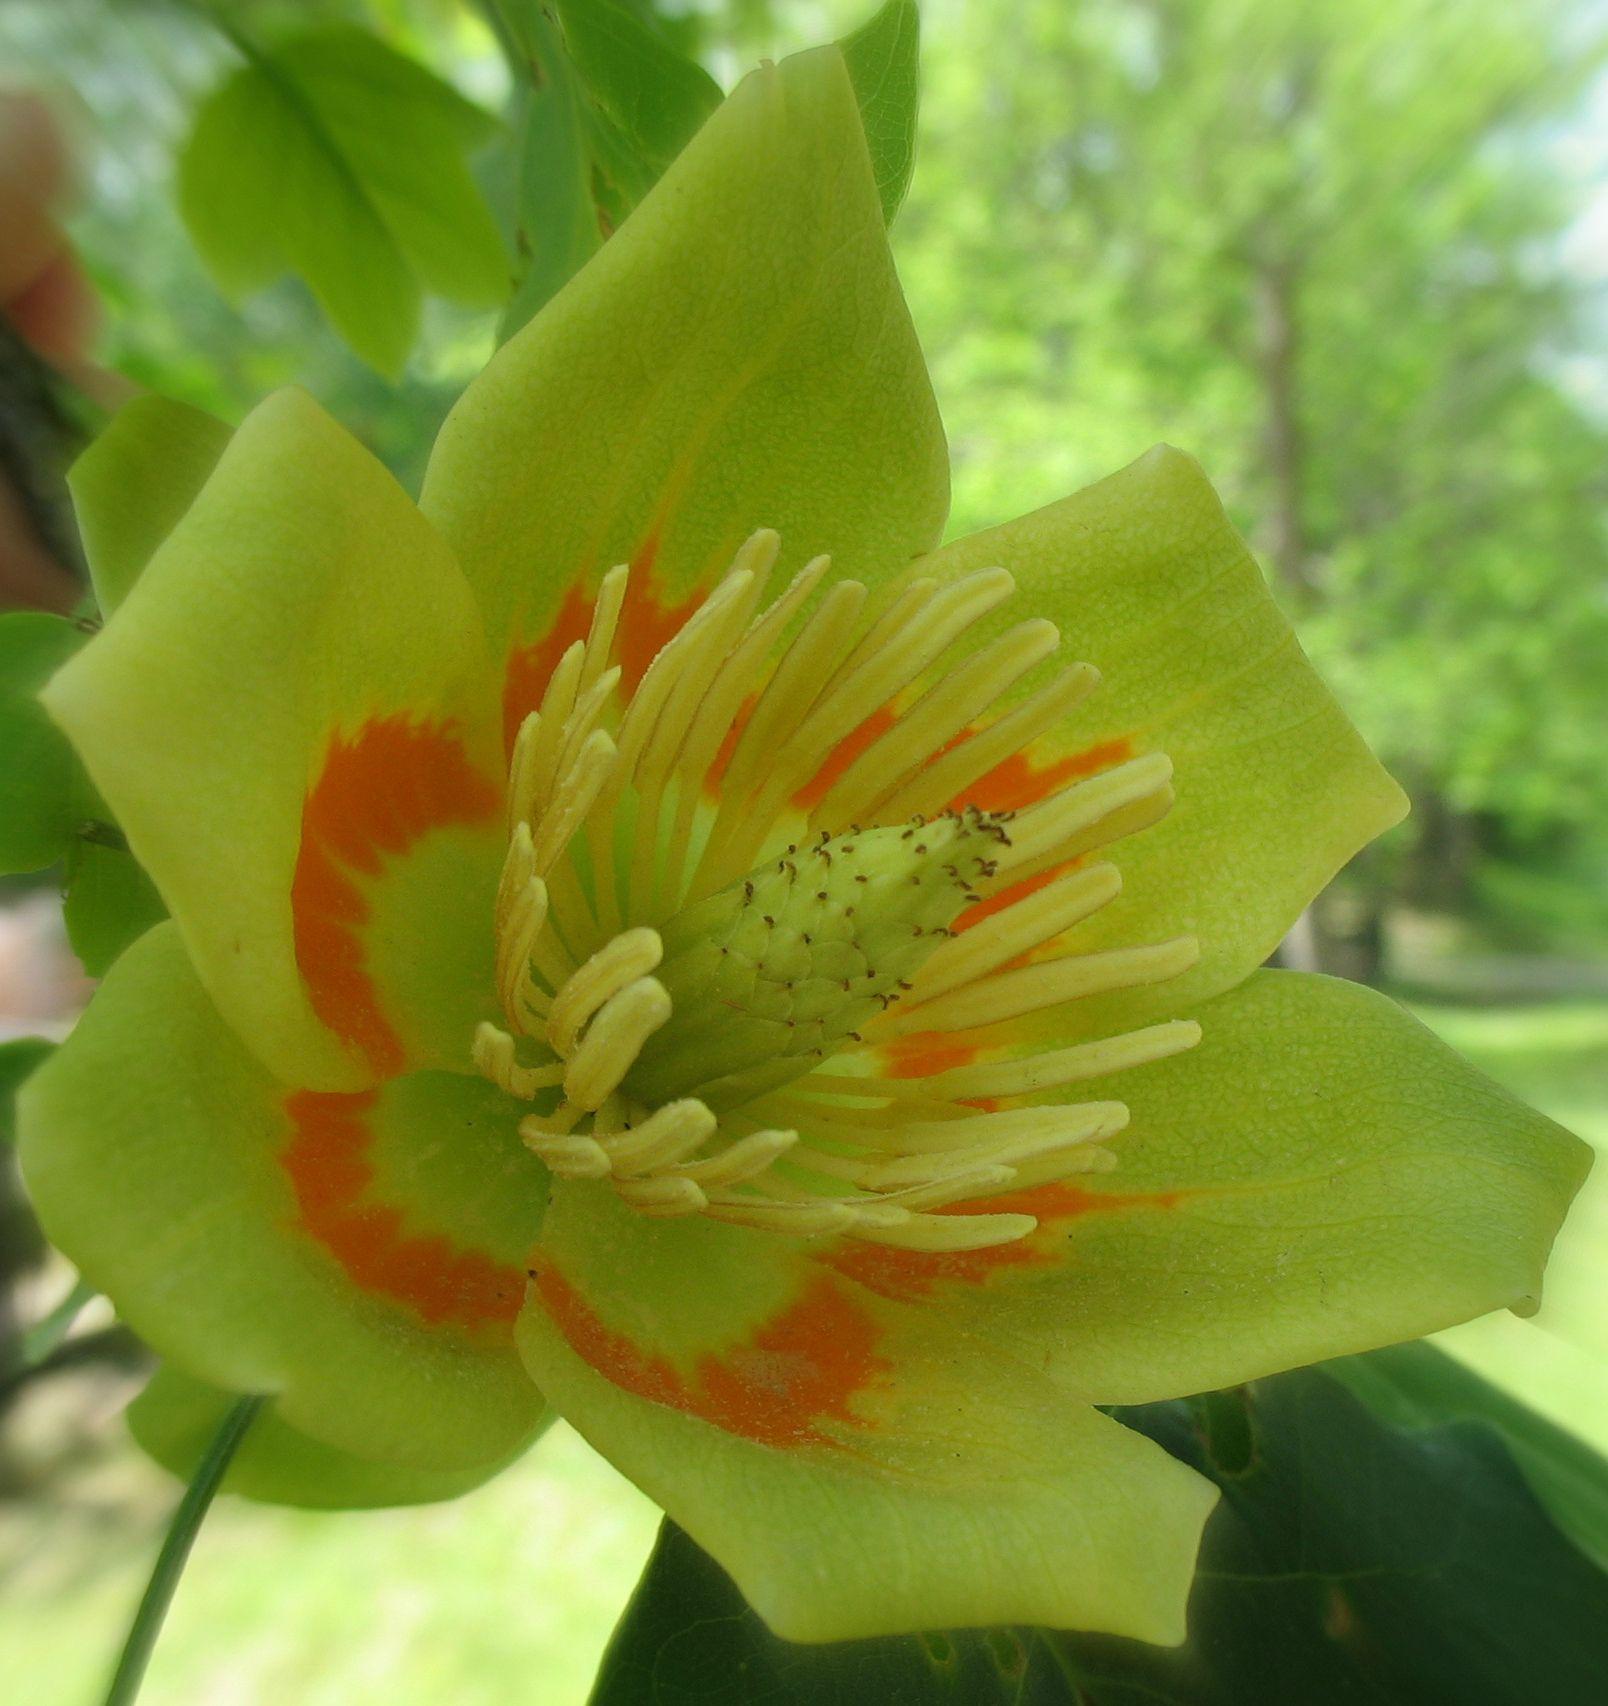 Small Ornamental Trees Nc: Tuliptree - Fast Growing Shade Tree